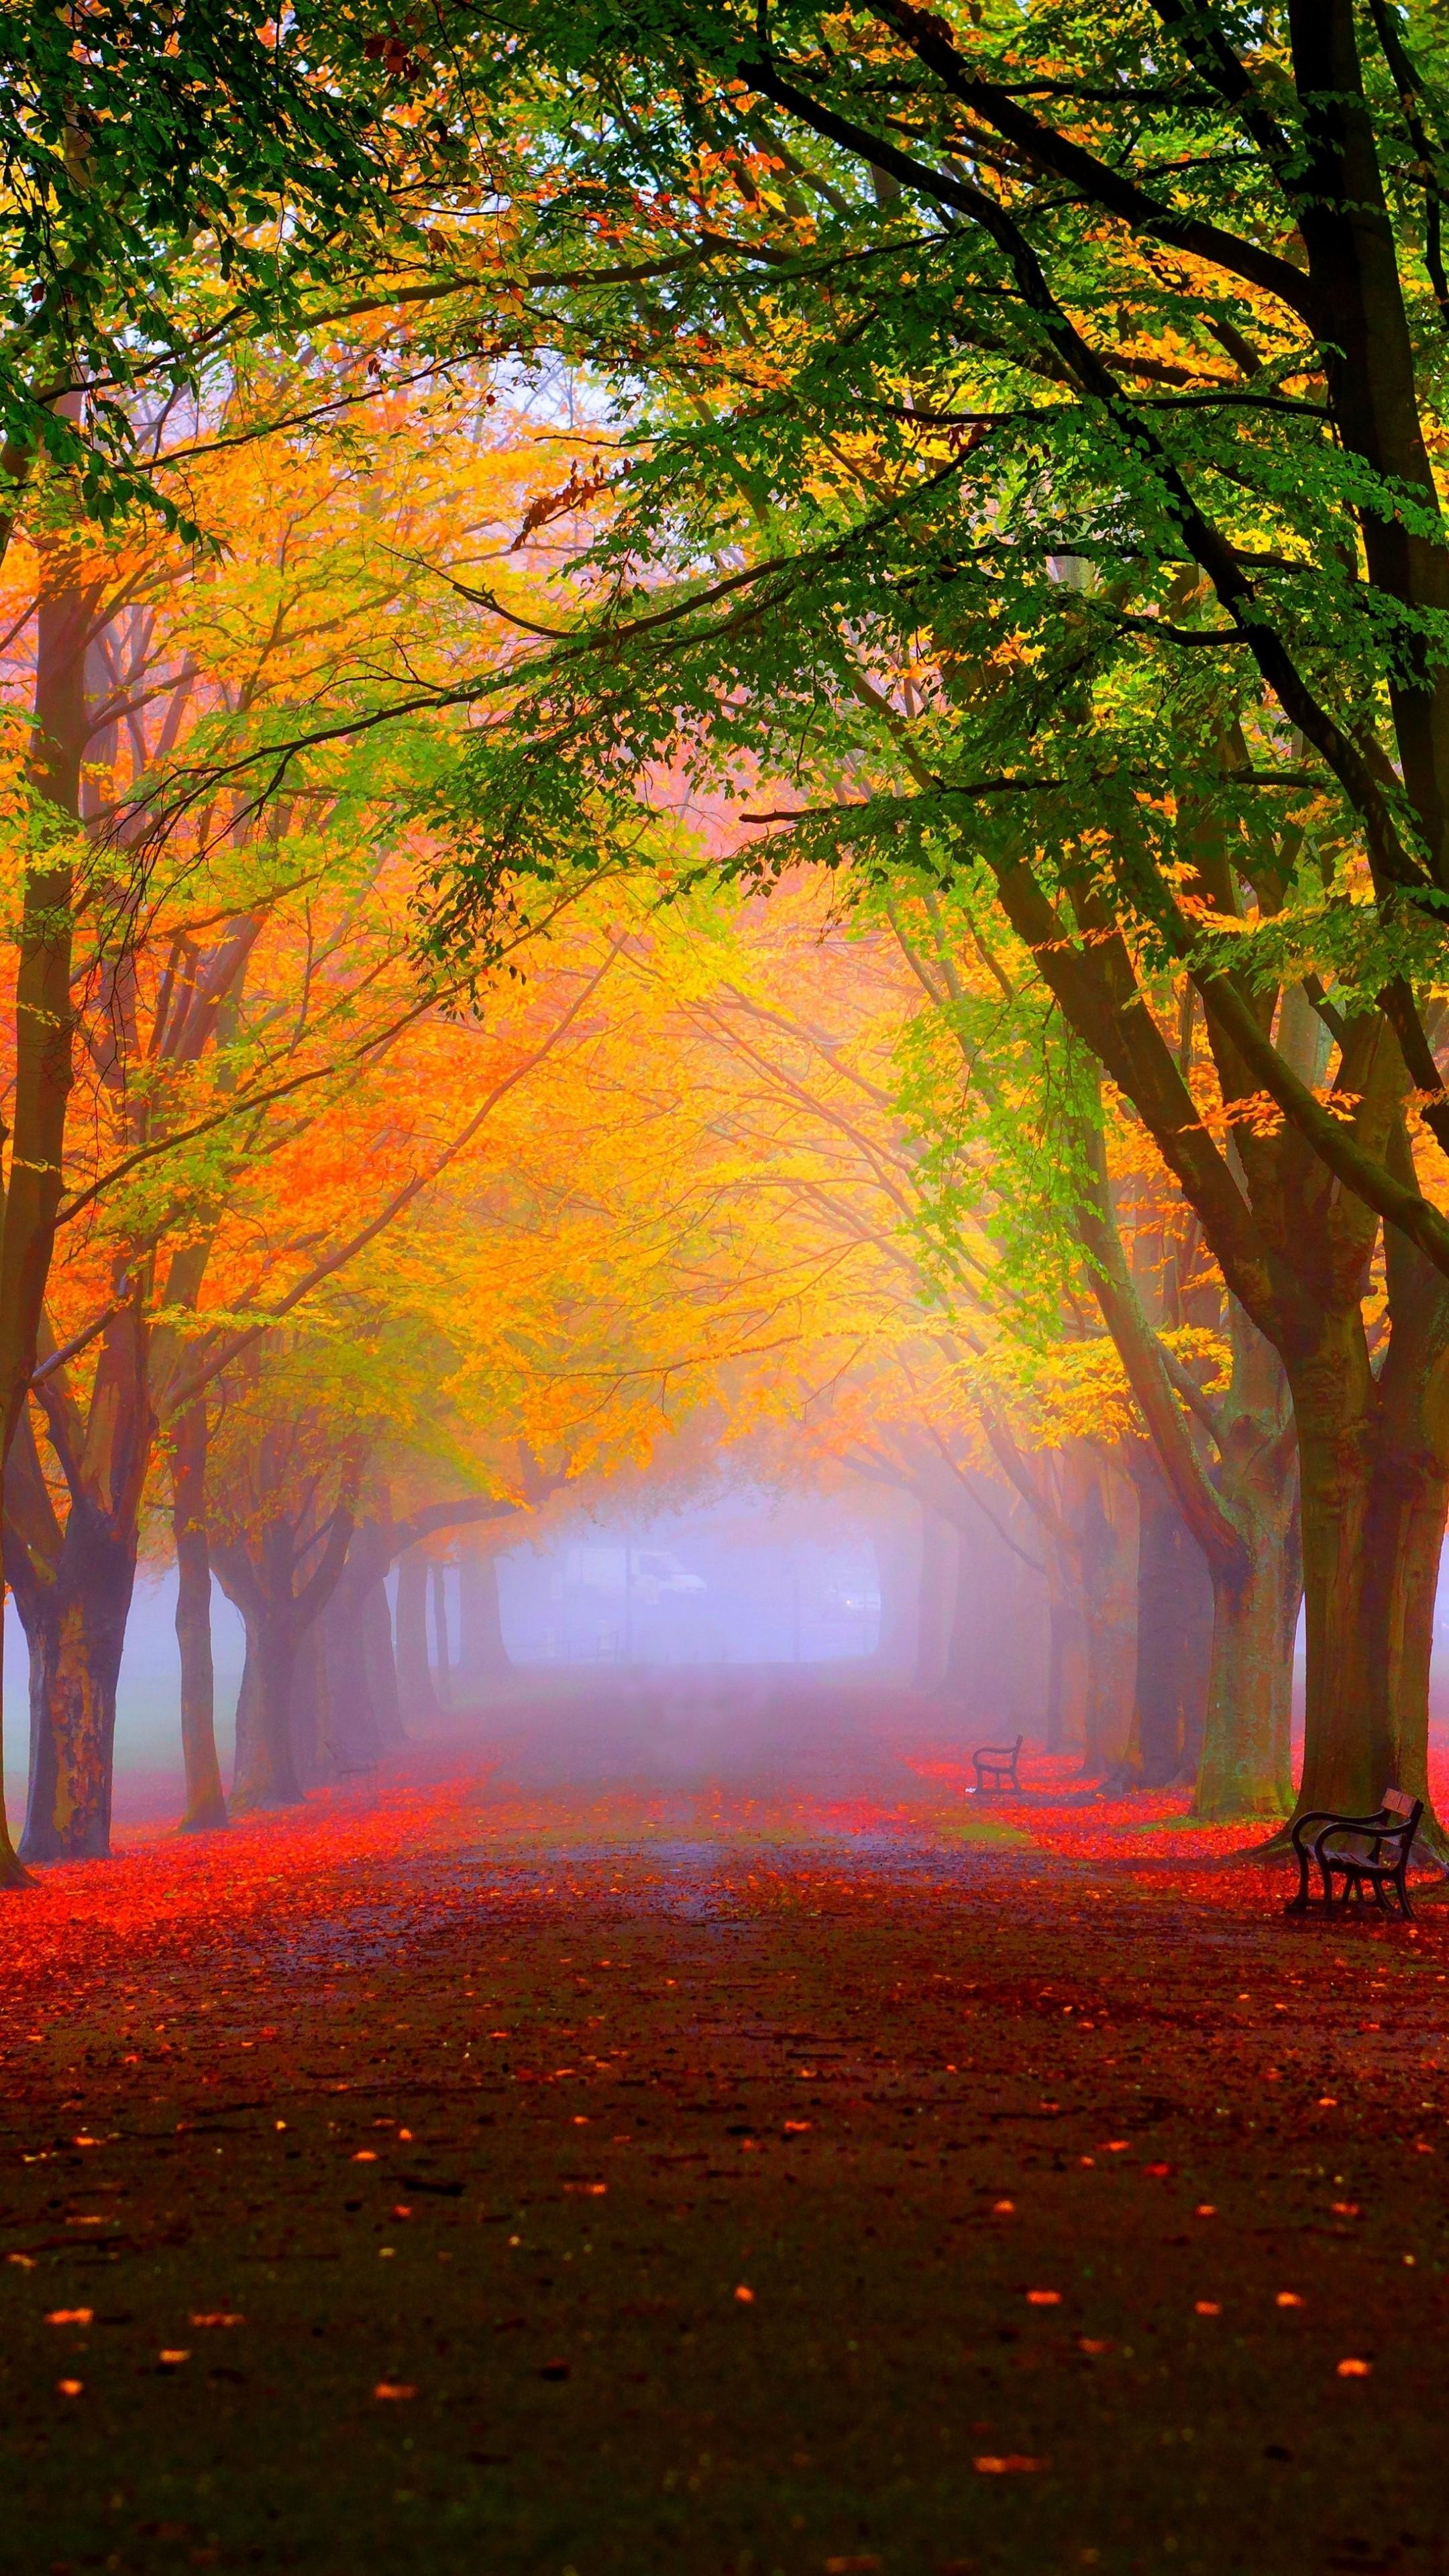 Fall Leaves Hd Desktop Wallpaper Wallpaper Park 5k 4k Wallpaper 8k Autumn Beautiful